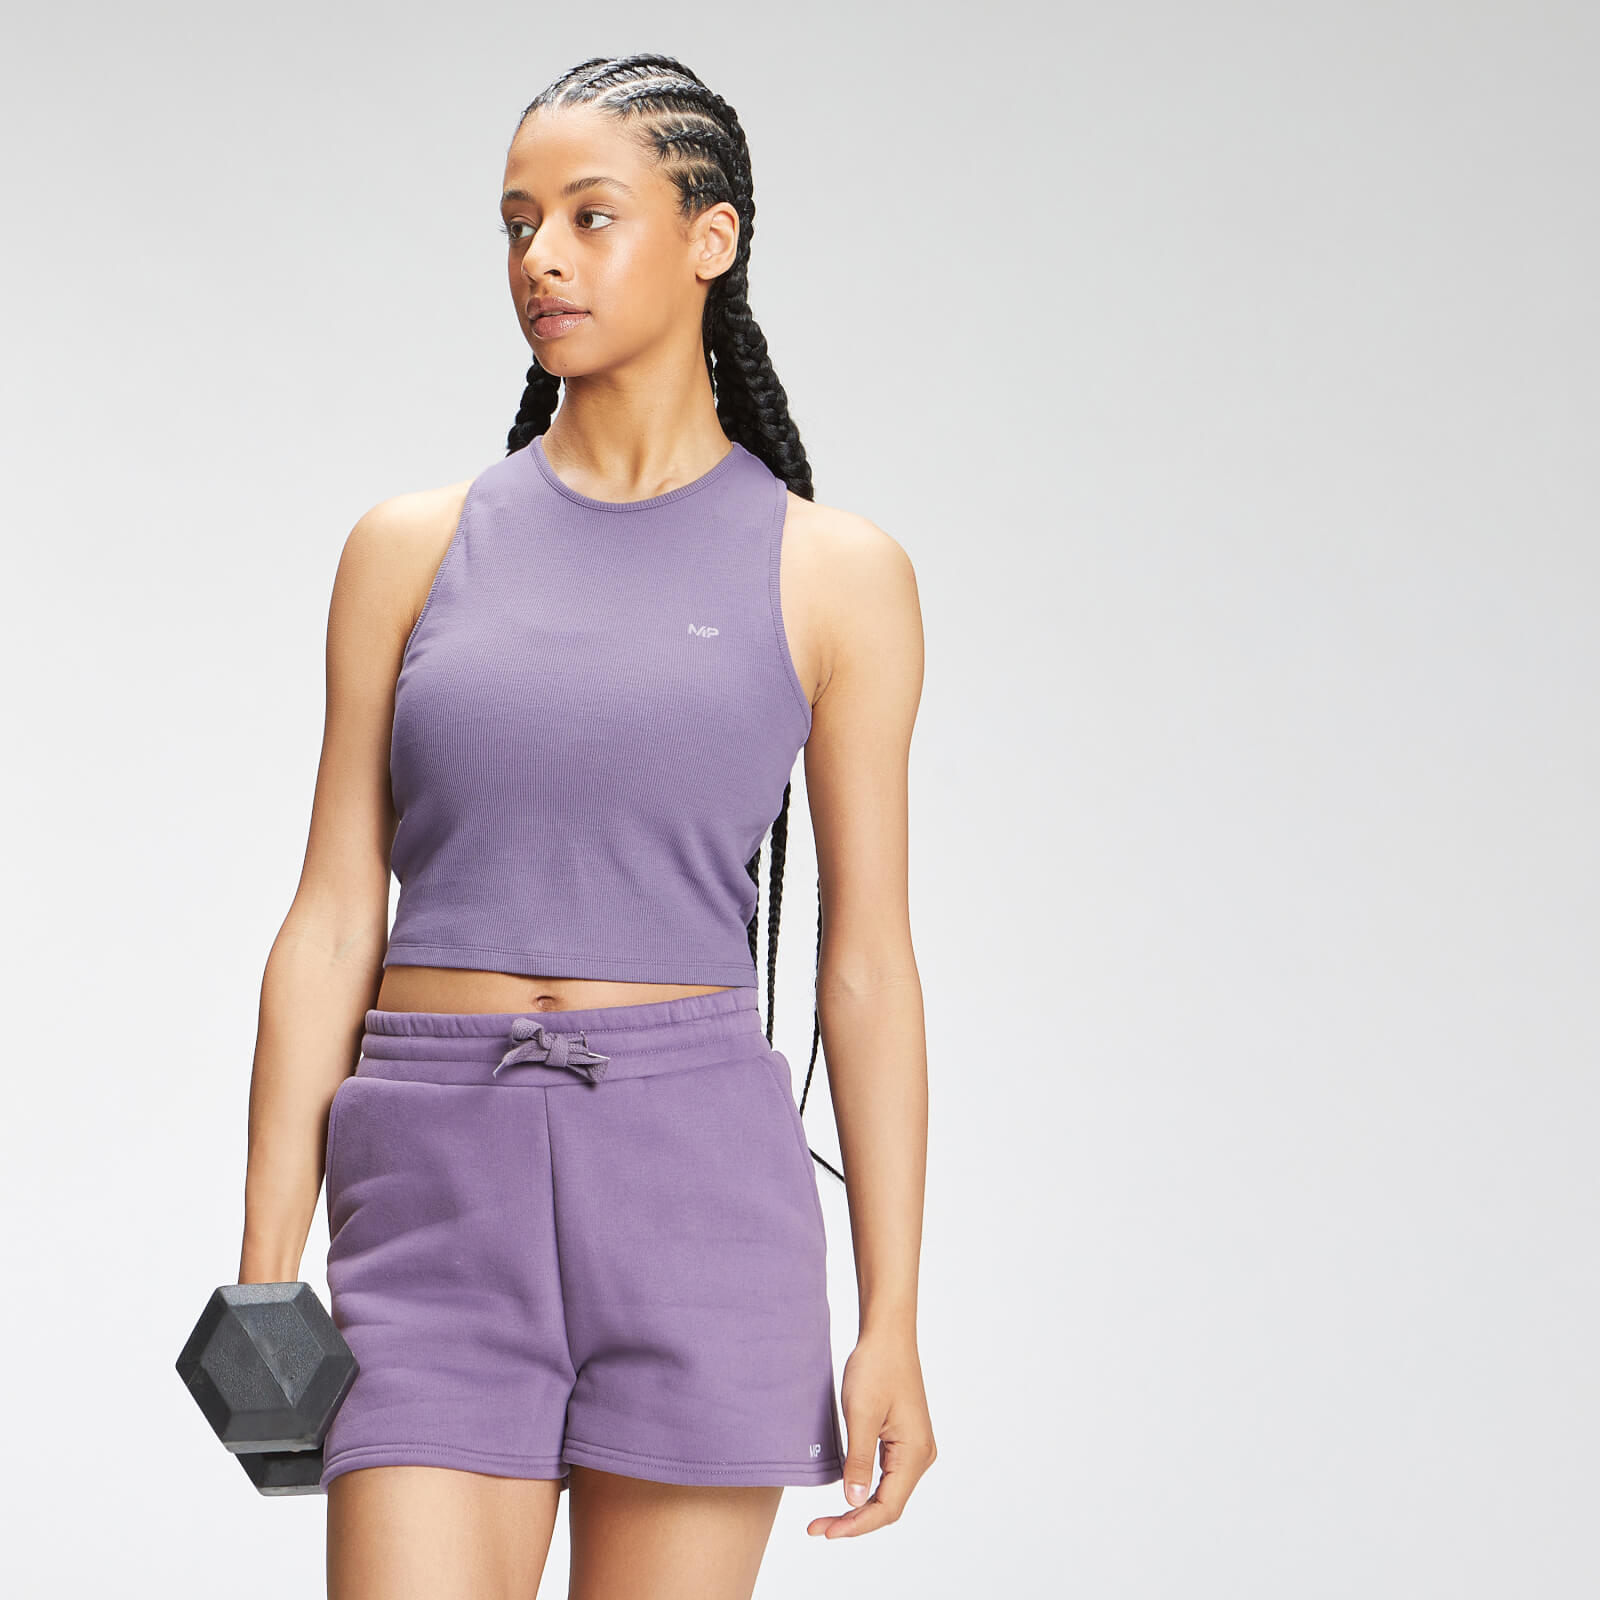 Купить MP Women's Essential Cropped Rib Vest - Smokey Purple - L, Myprotein International